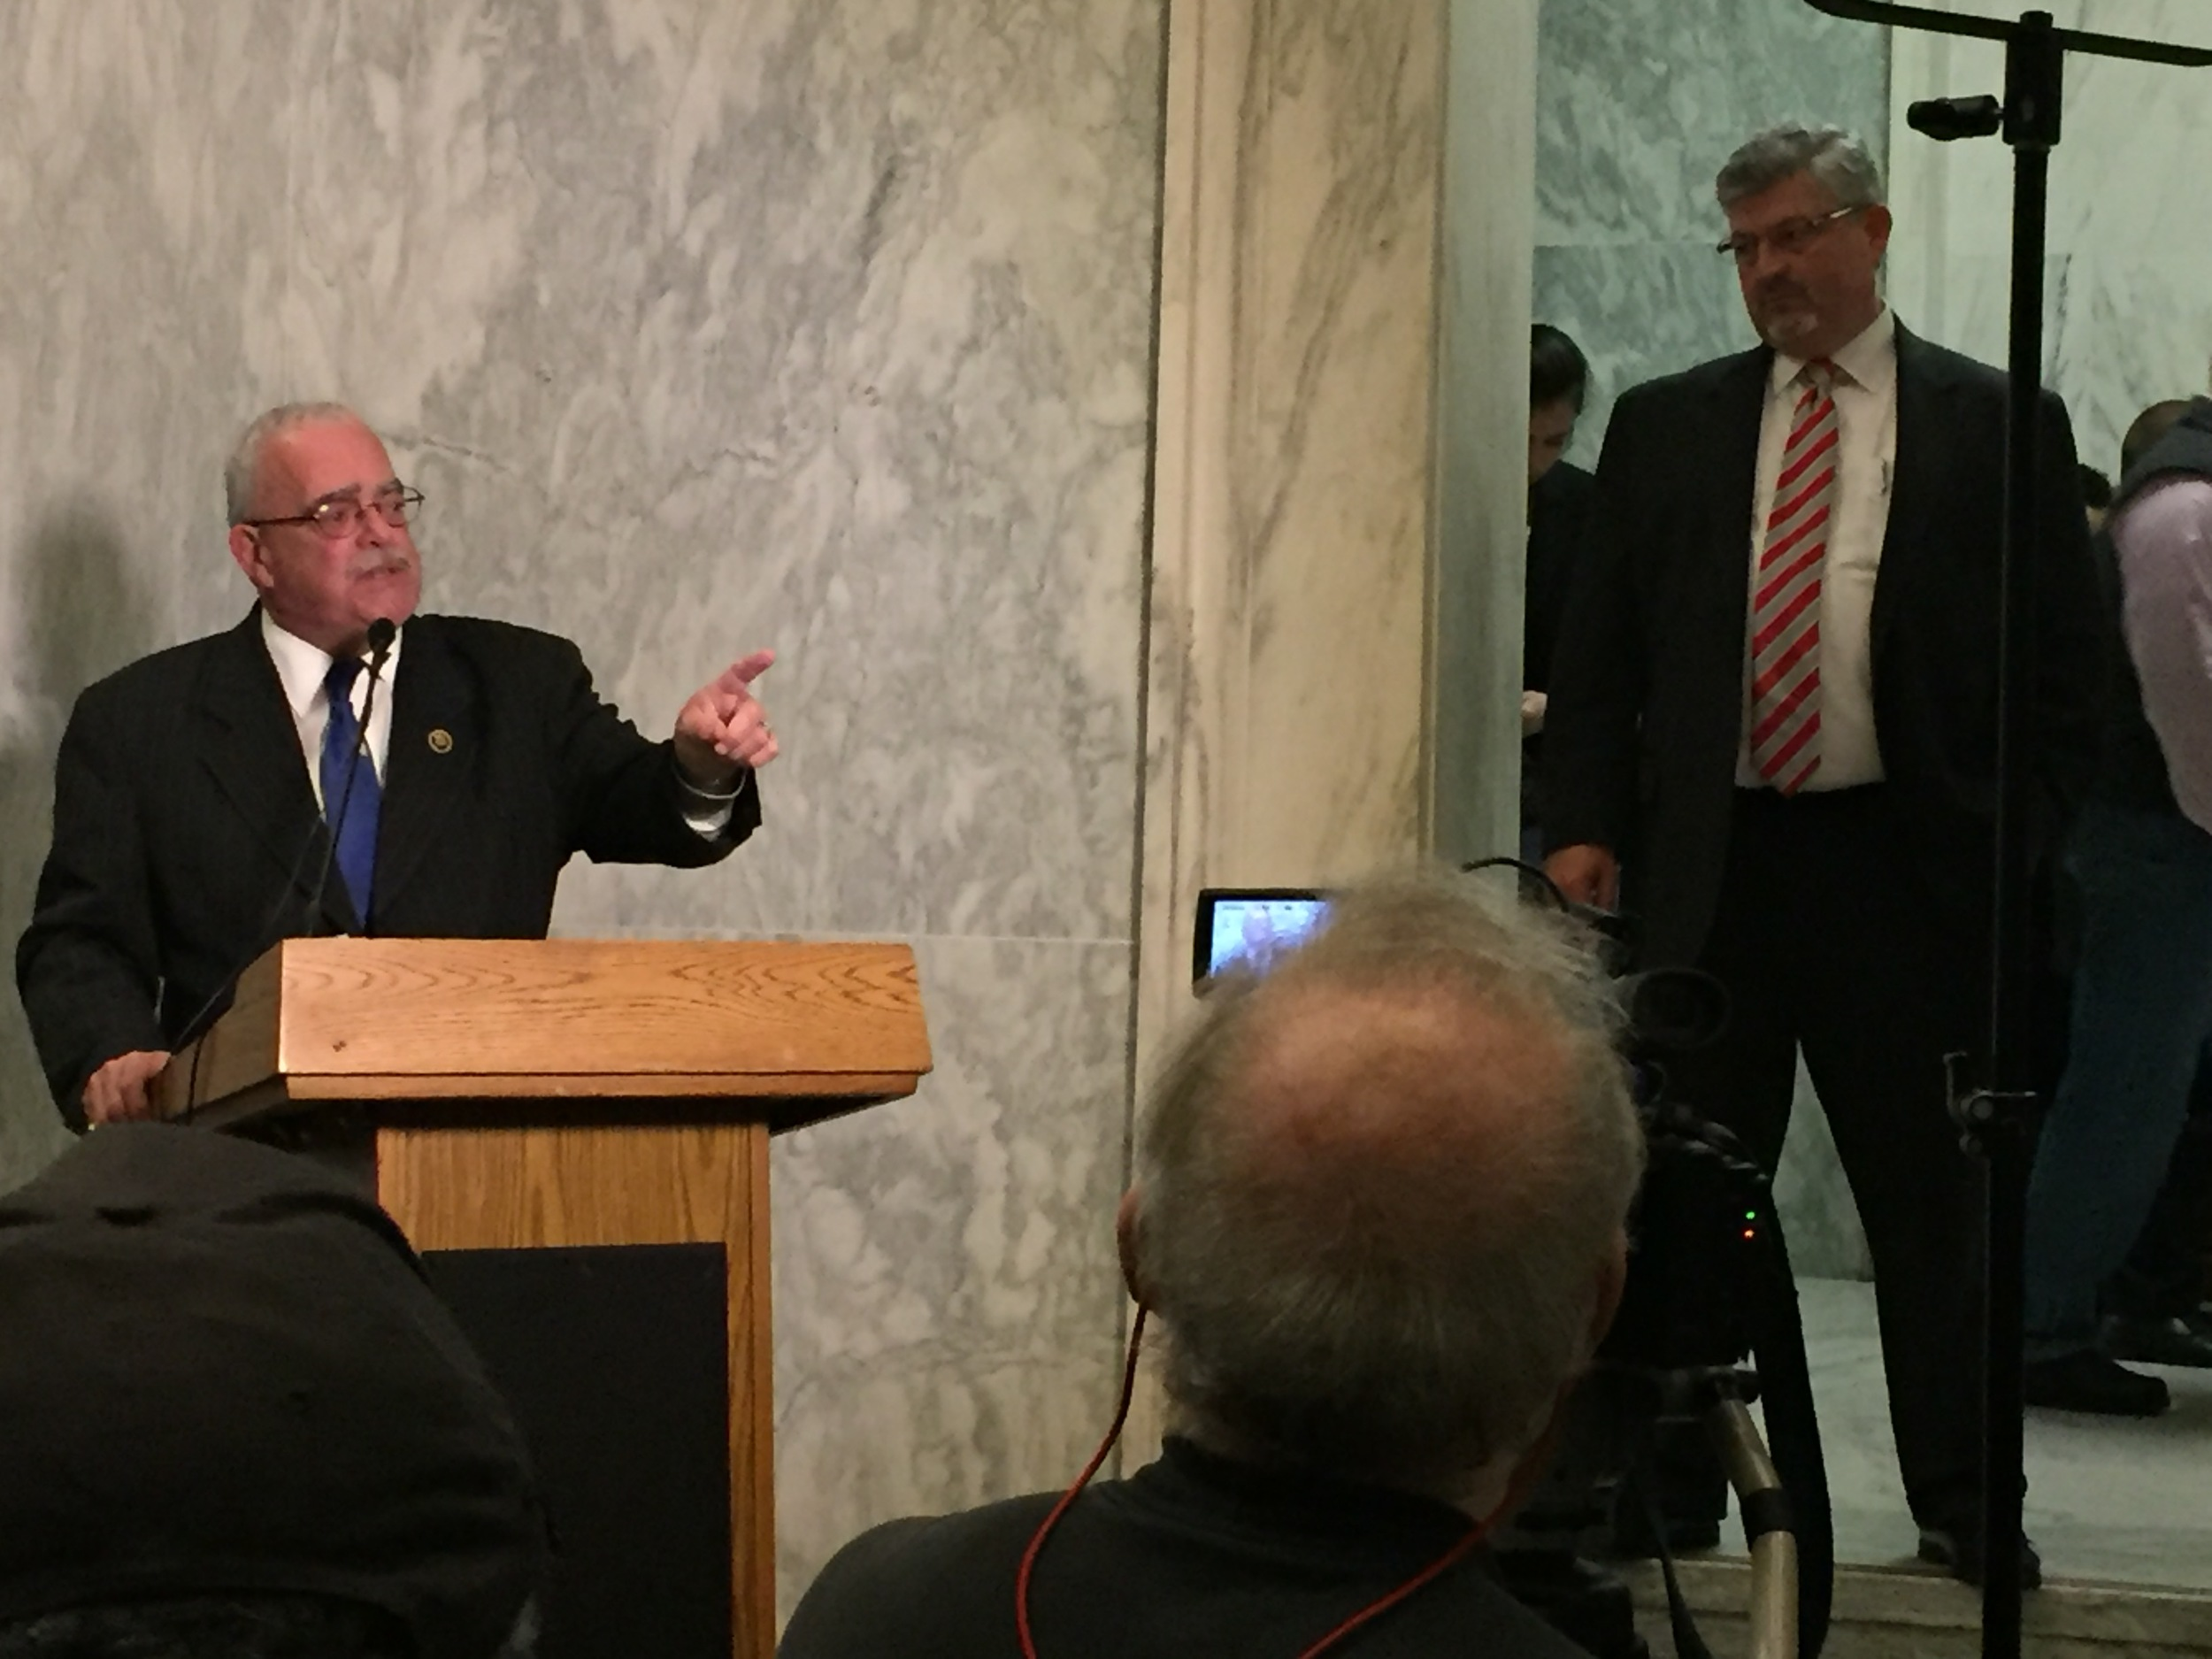 Northern Virginia Congressman Gerry Connolly addresses NTEU members while NTEU President Tony Reardon looks on during the evening congressional reception.